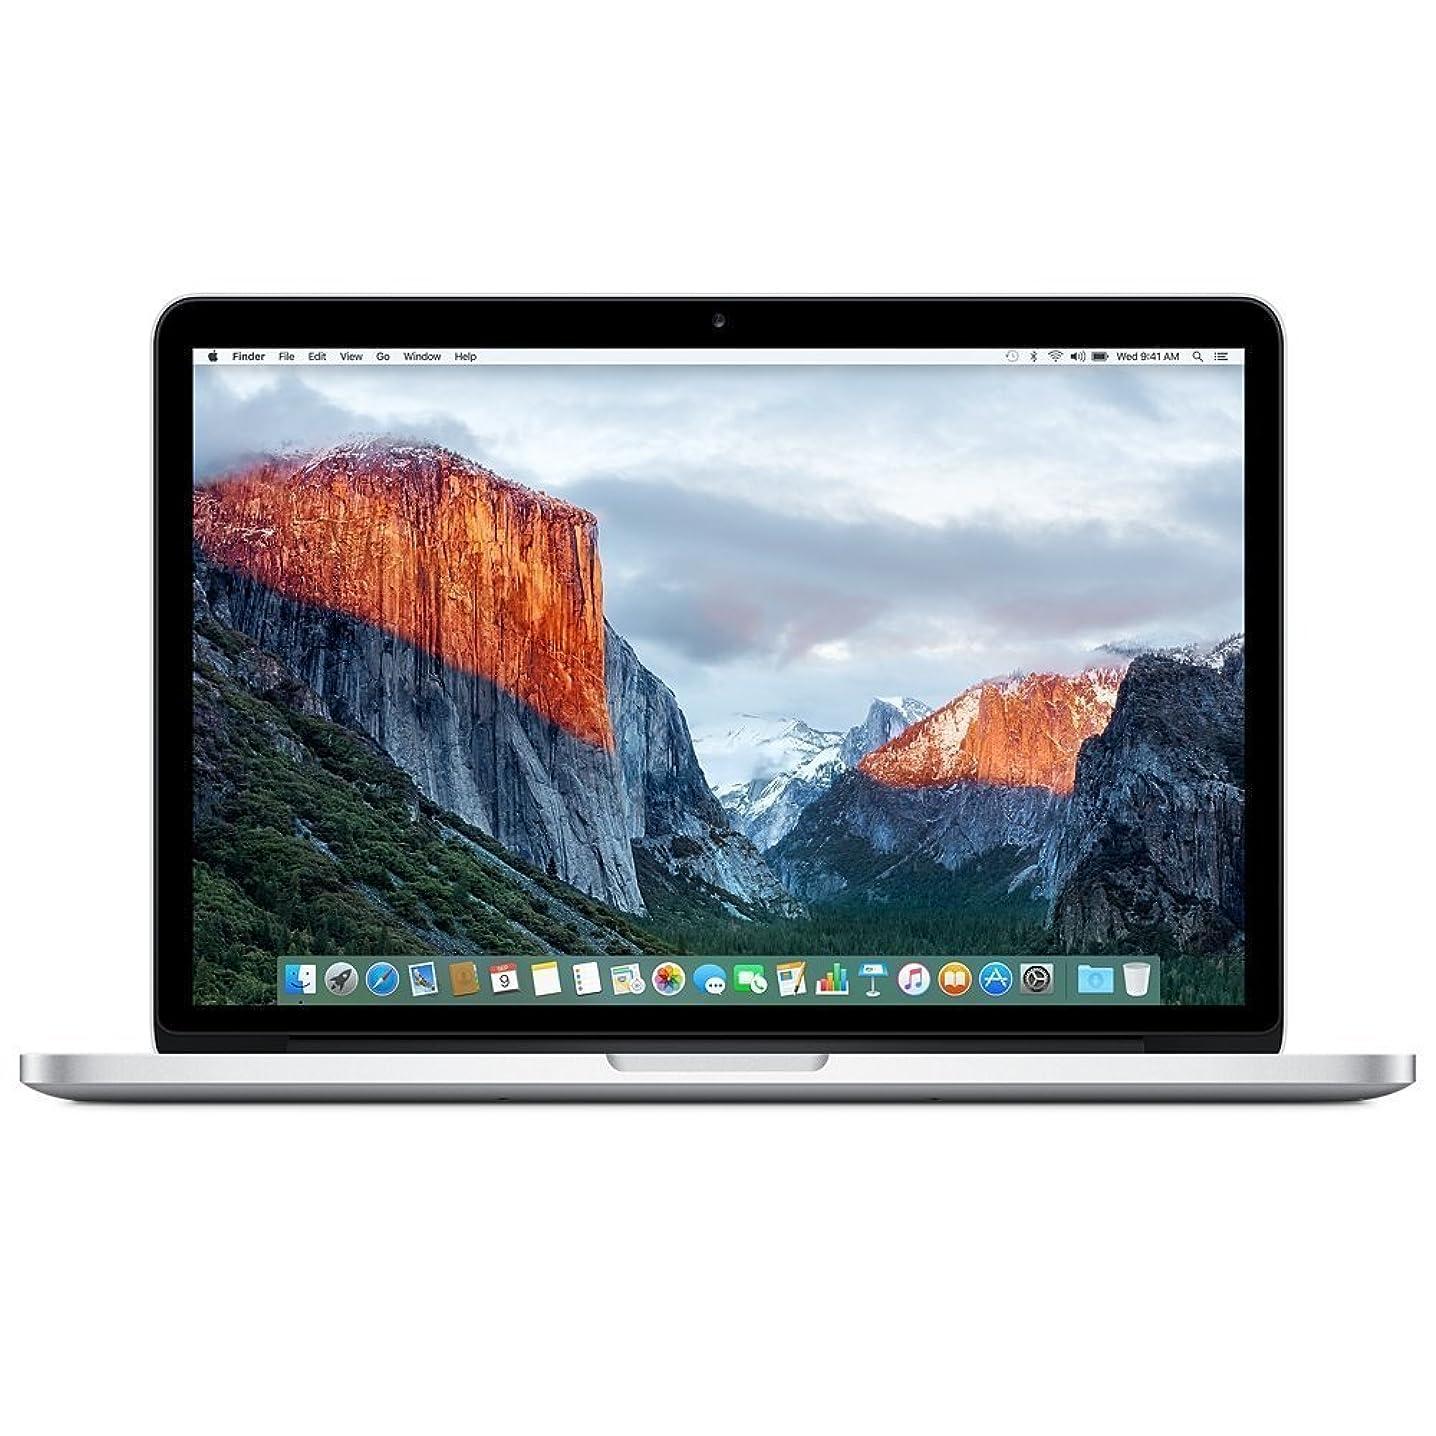 Apple MacBook Pro GB Wi-Fi Laptop 256GB 13